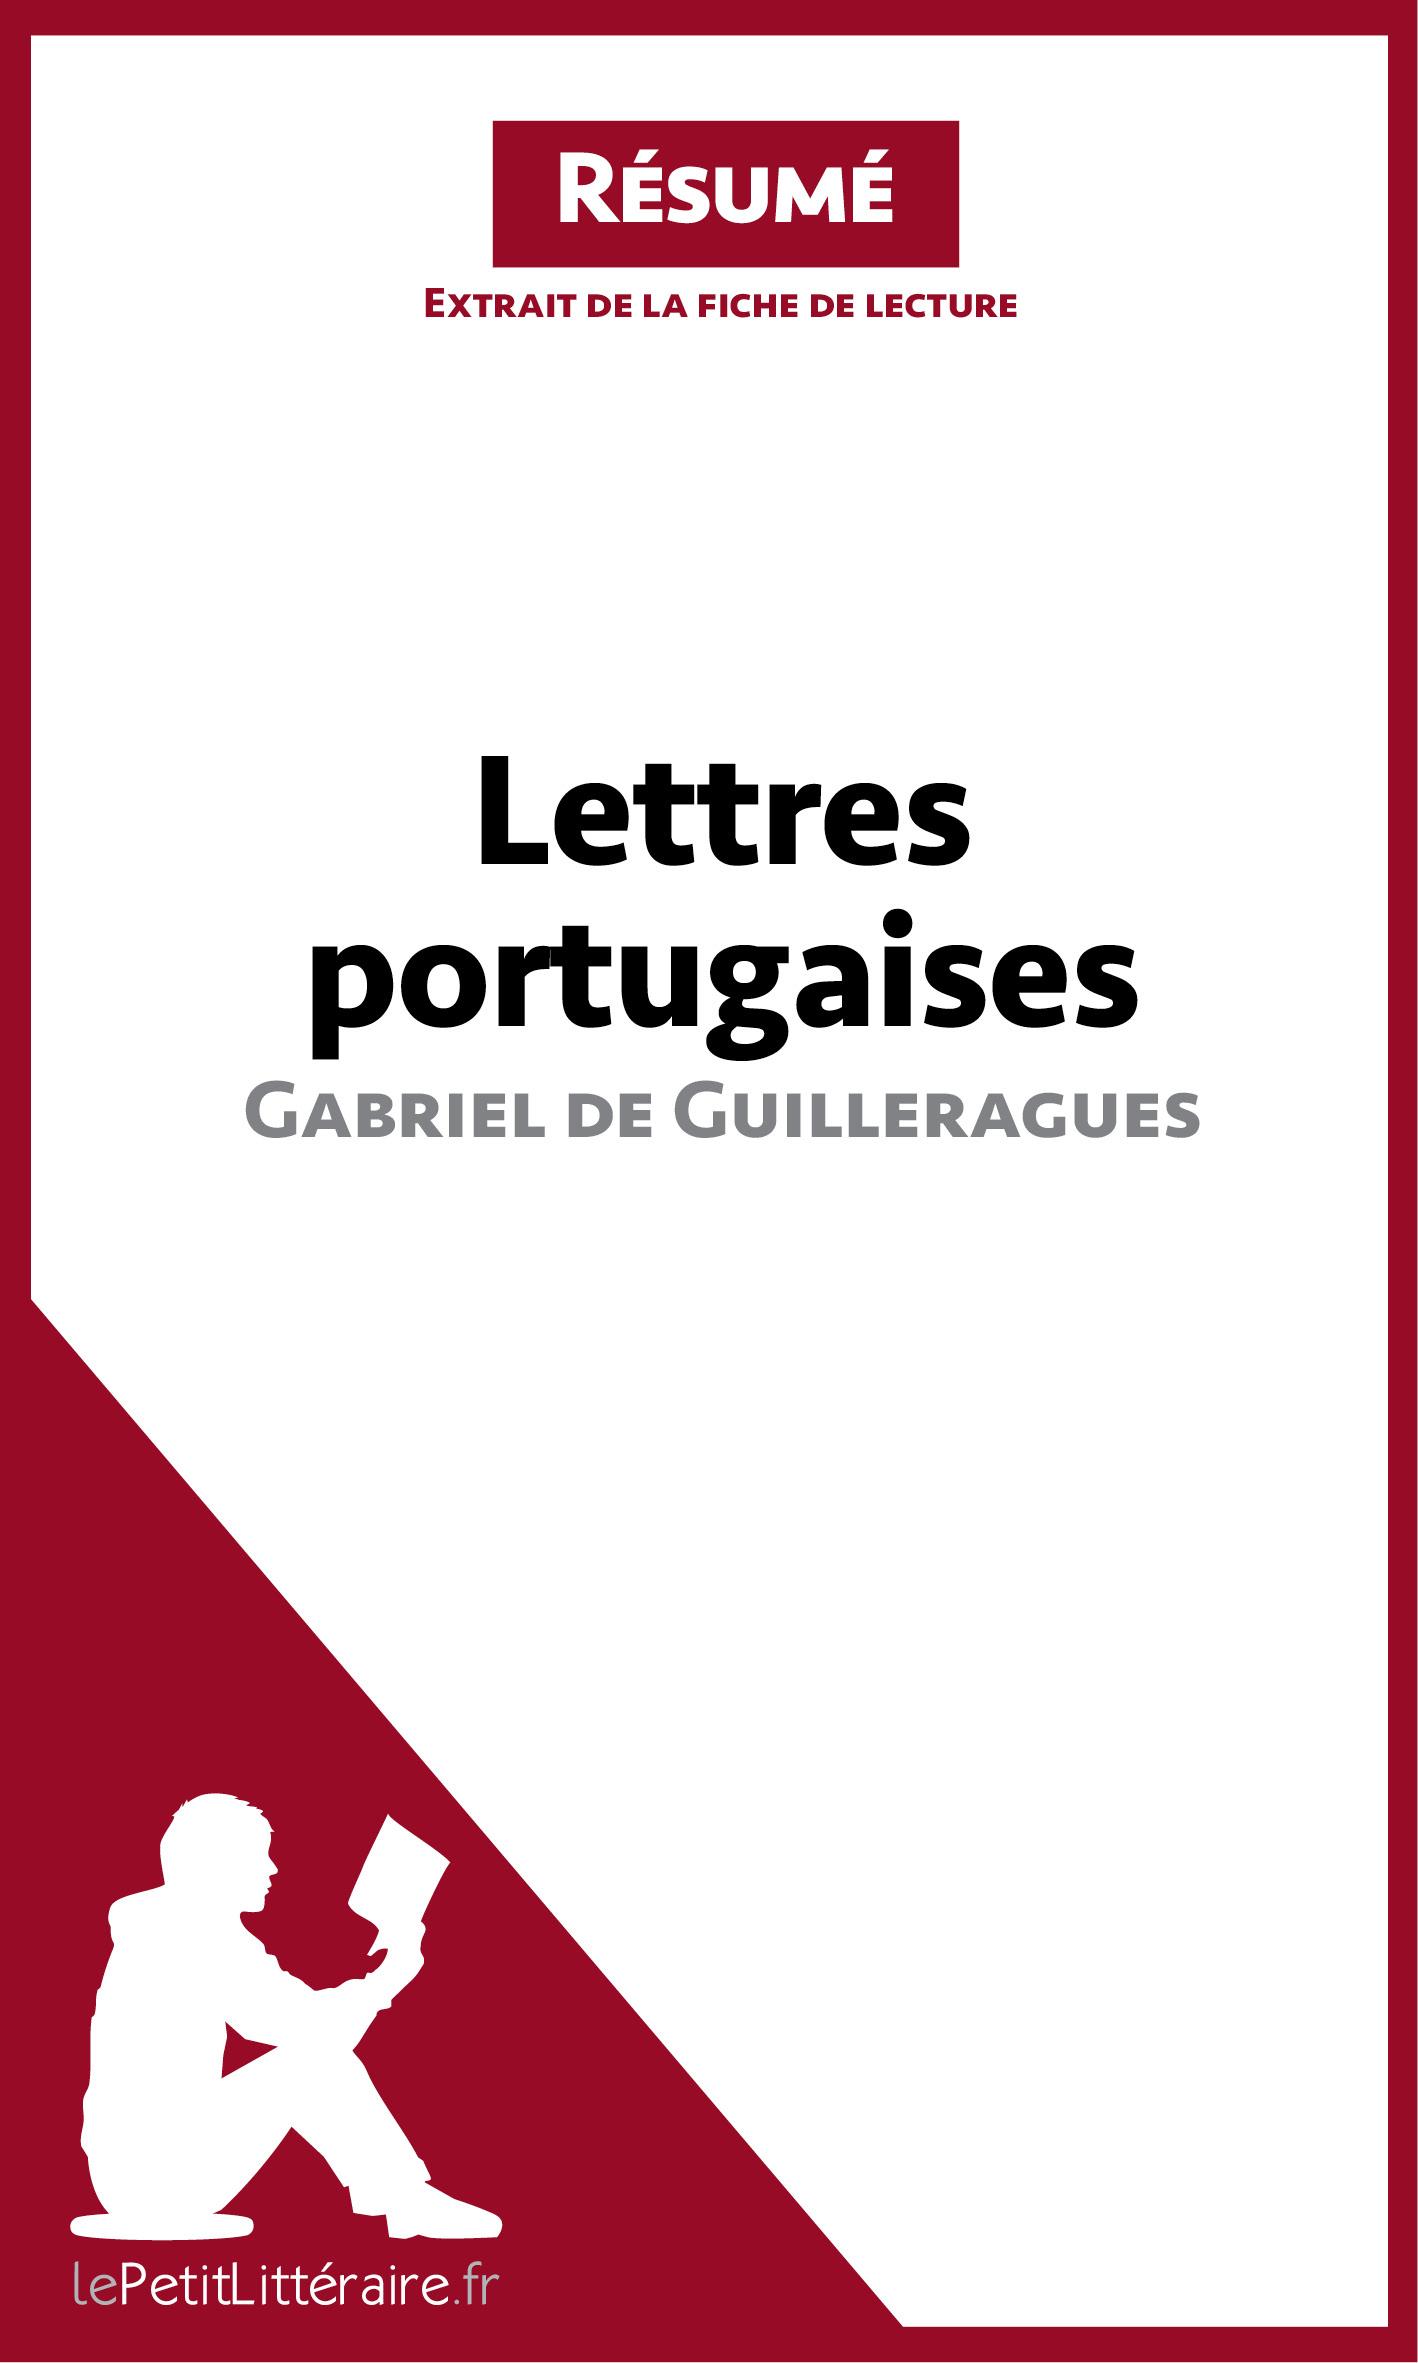 Lettres portugaises